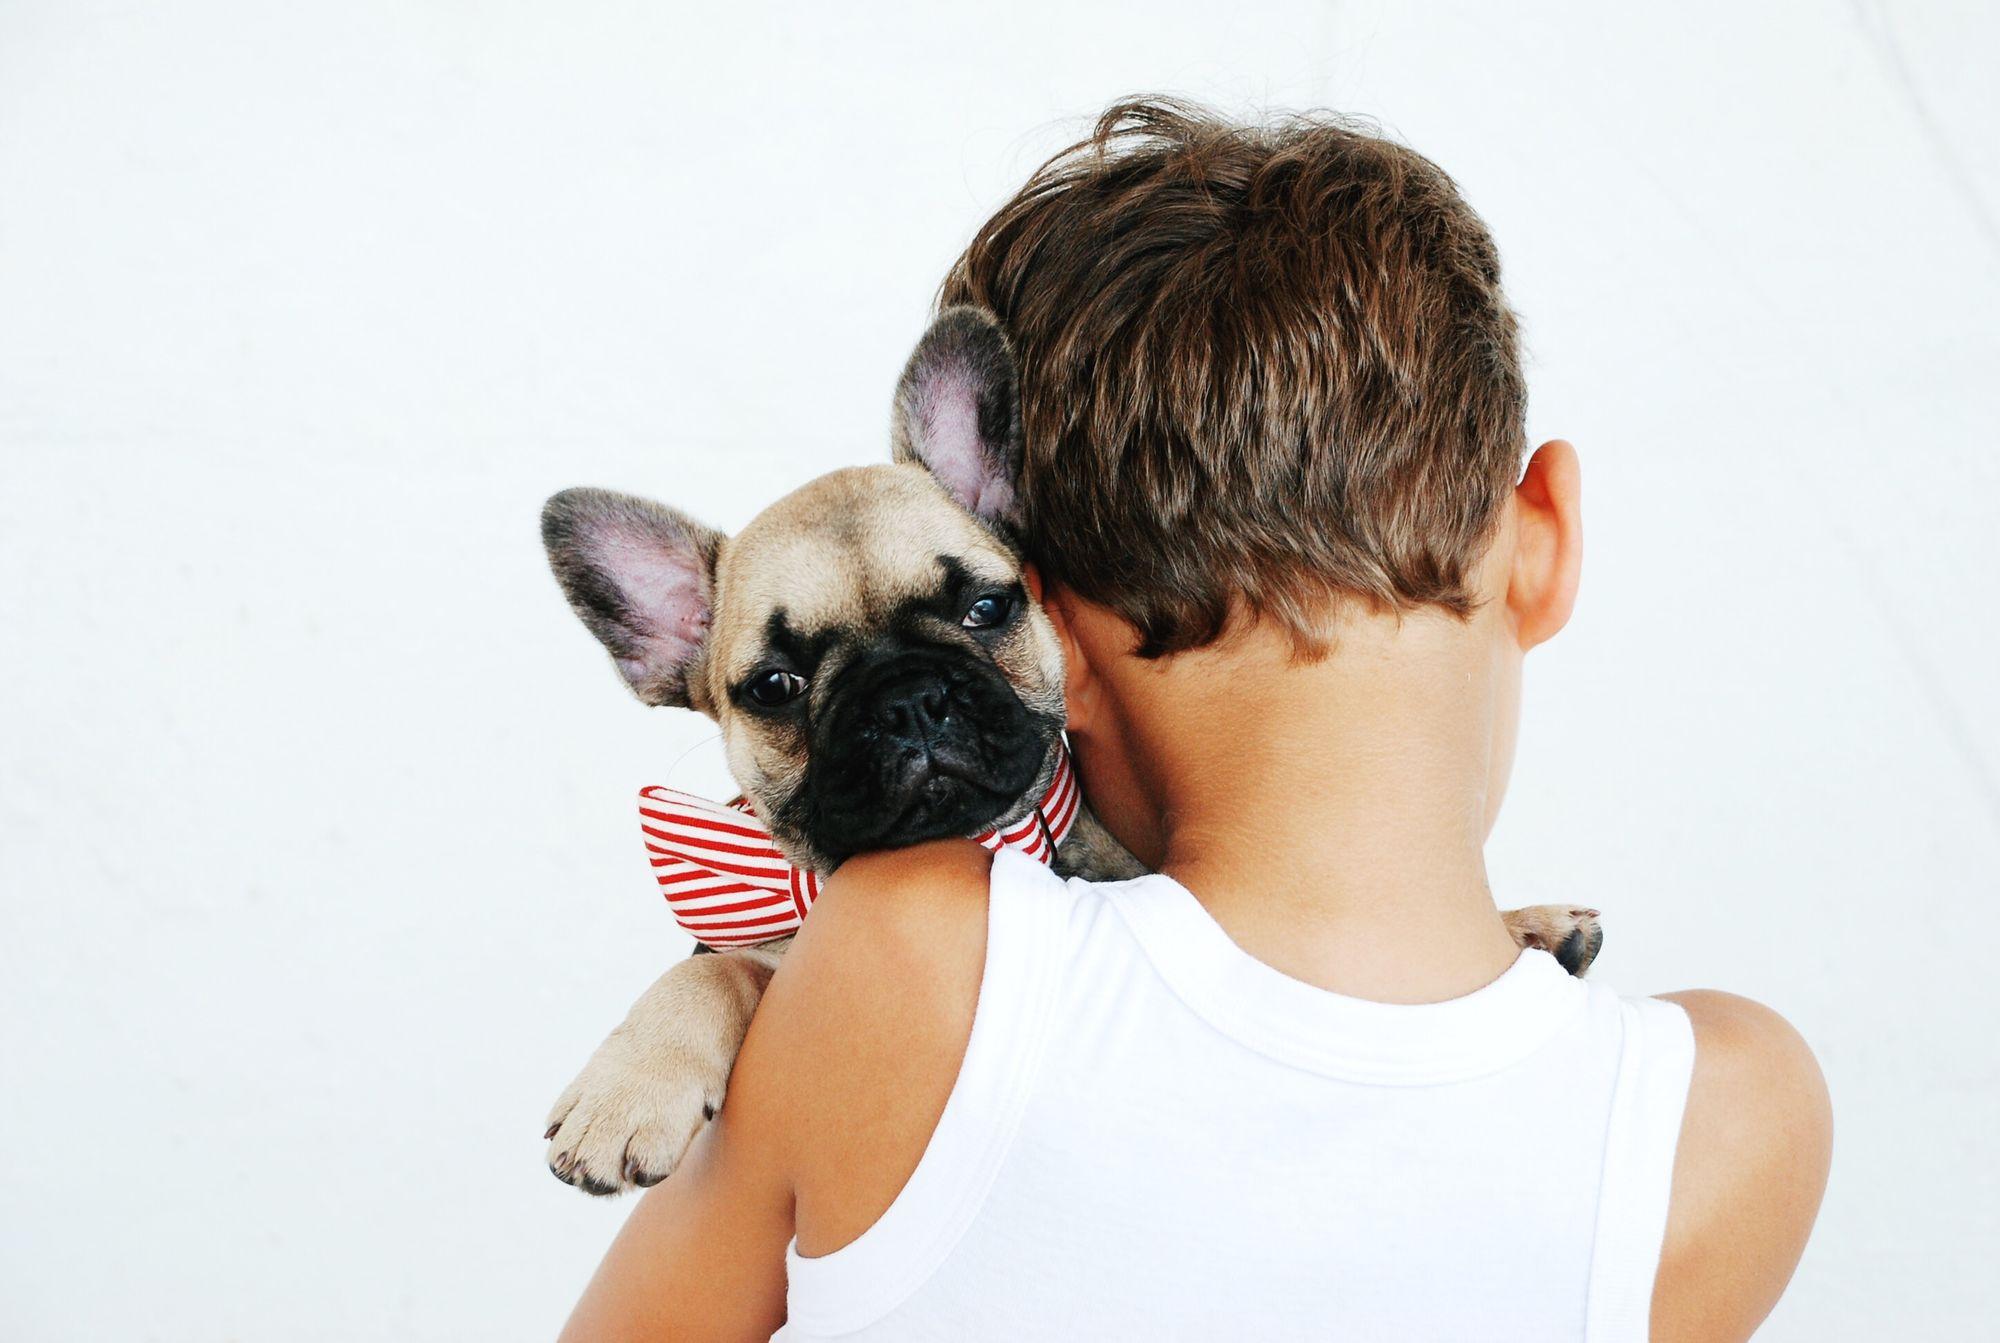 pug-affectionate-with-kids-unsplash-source